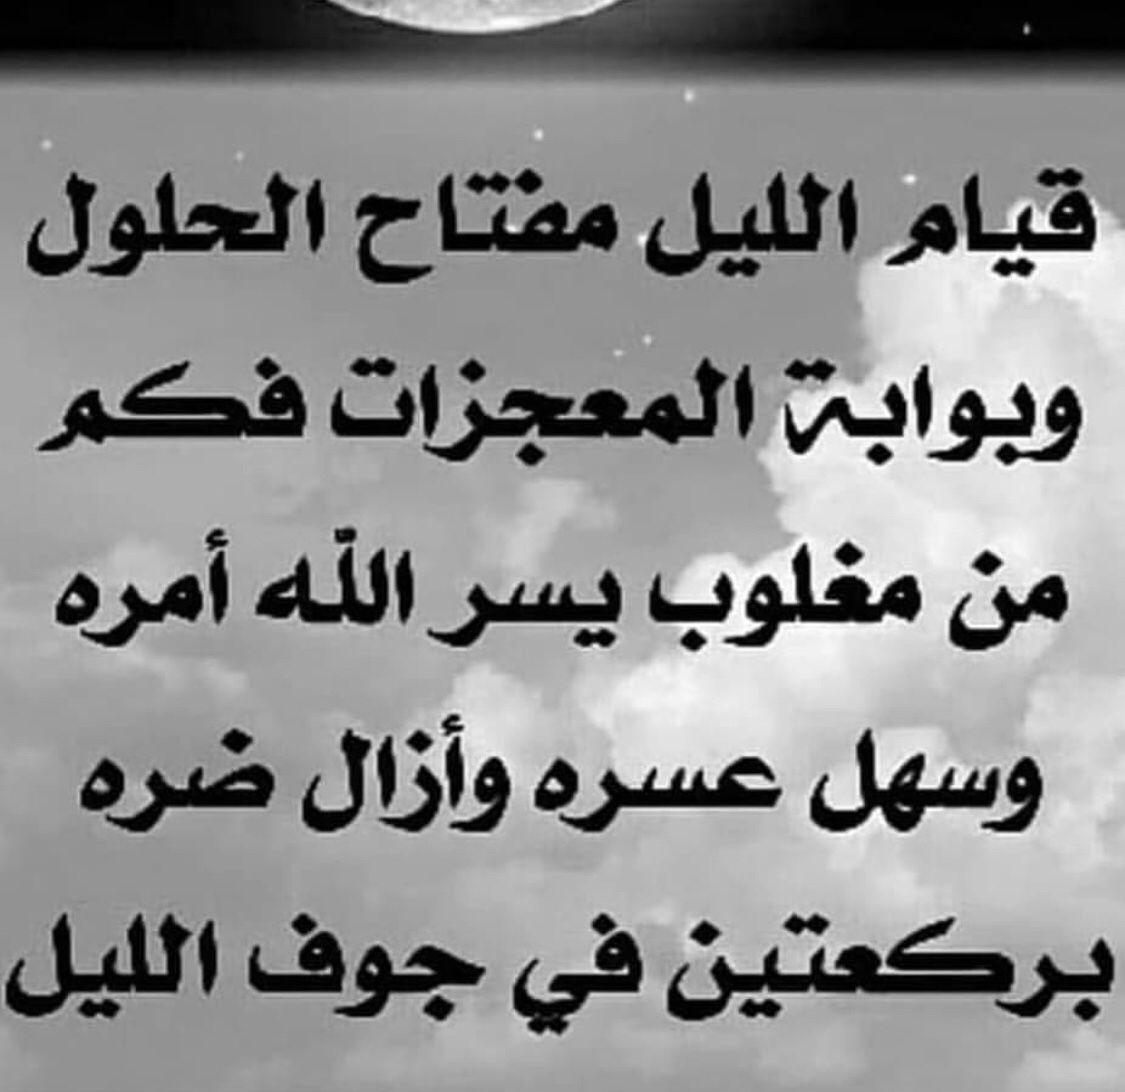 قيام الليل مفتاح الحلول Wise Words Quotes Islamic Quotes Arabic Quotes